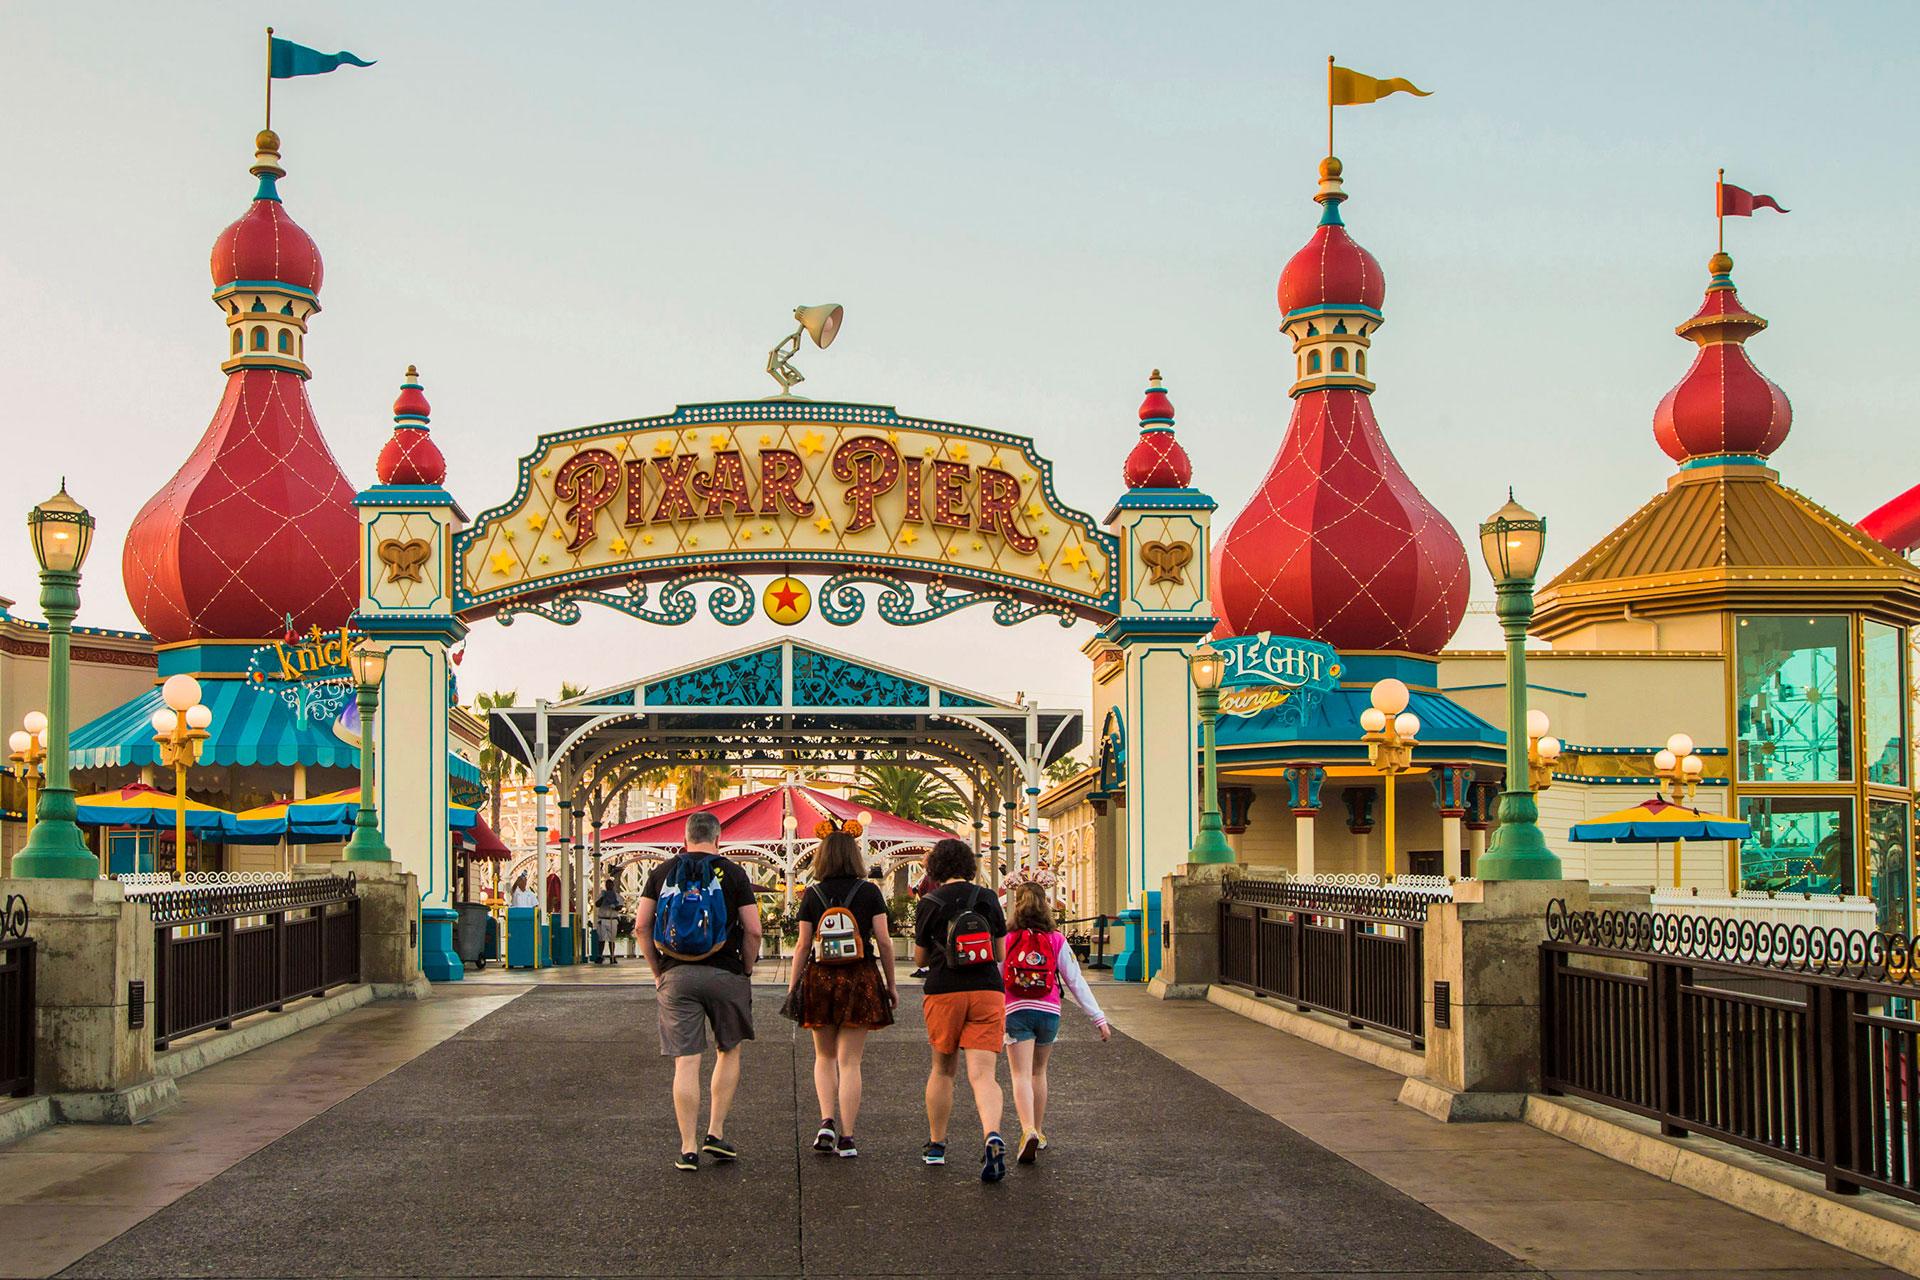 Pixar Pier at Disneyland in California; Courtesy of Disney